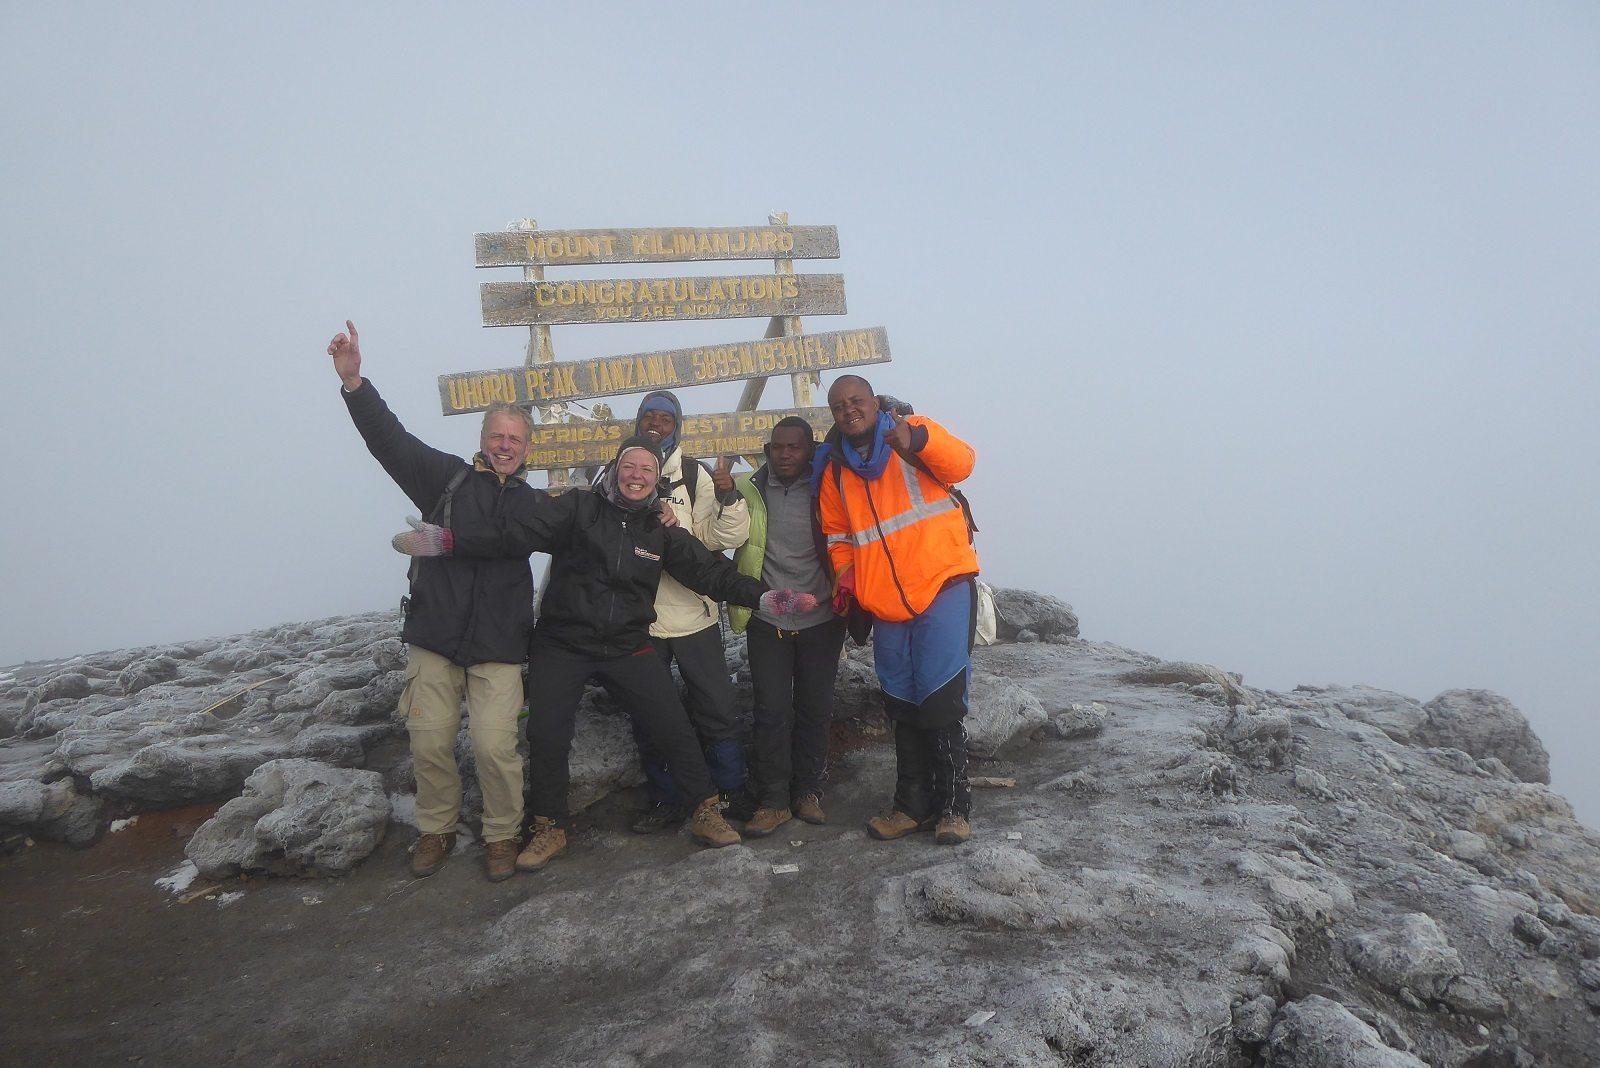 Uhuru Peak. Foto: Johan Blokvoord